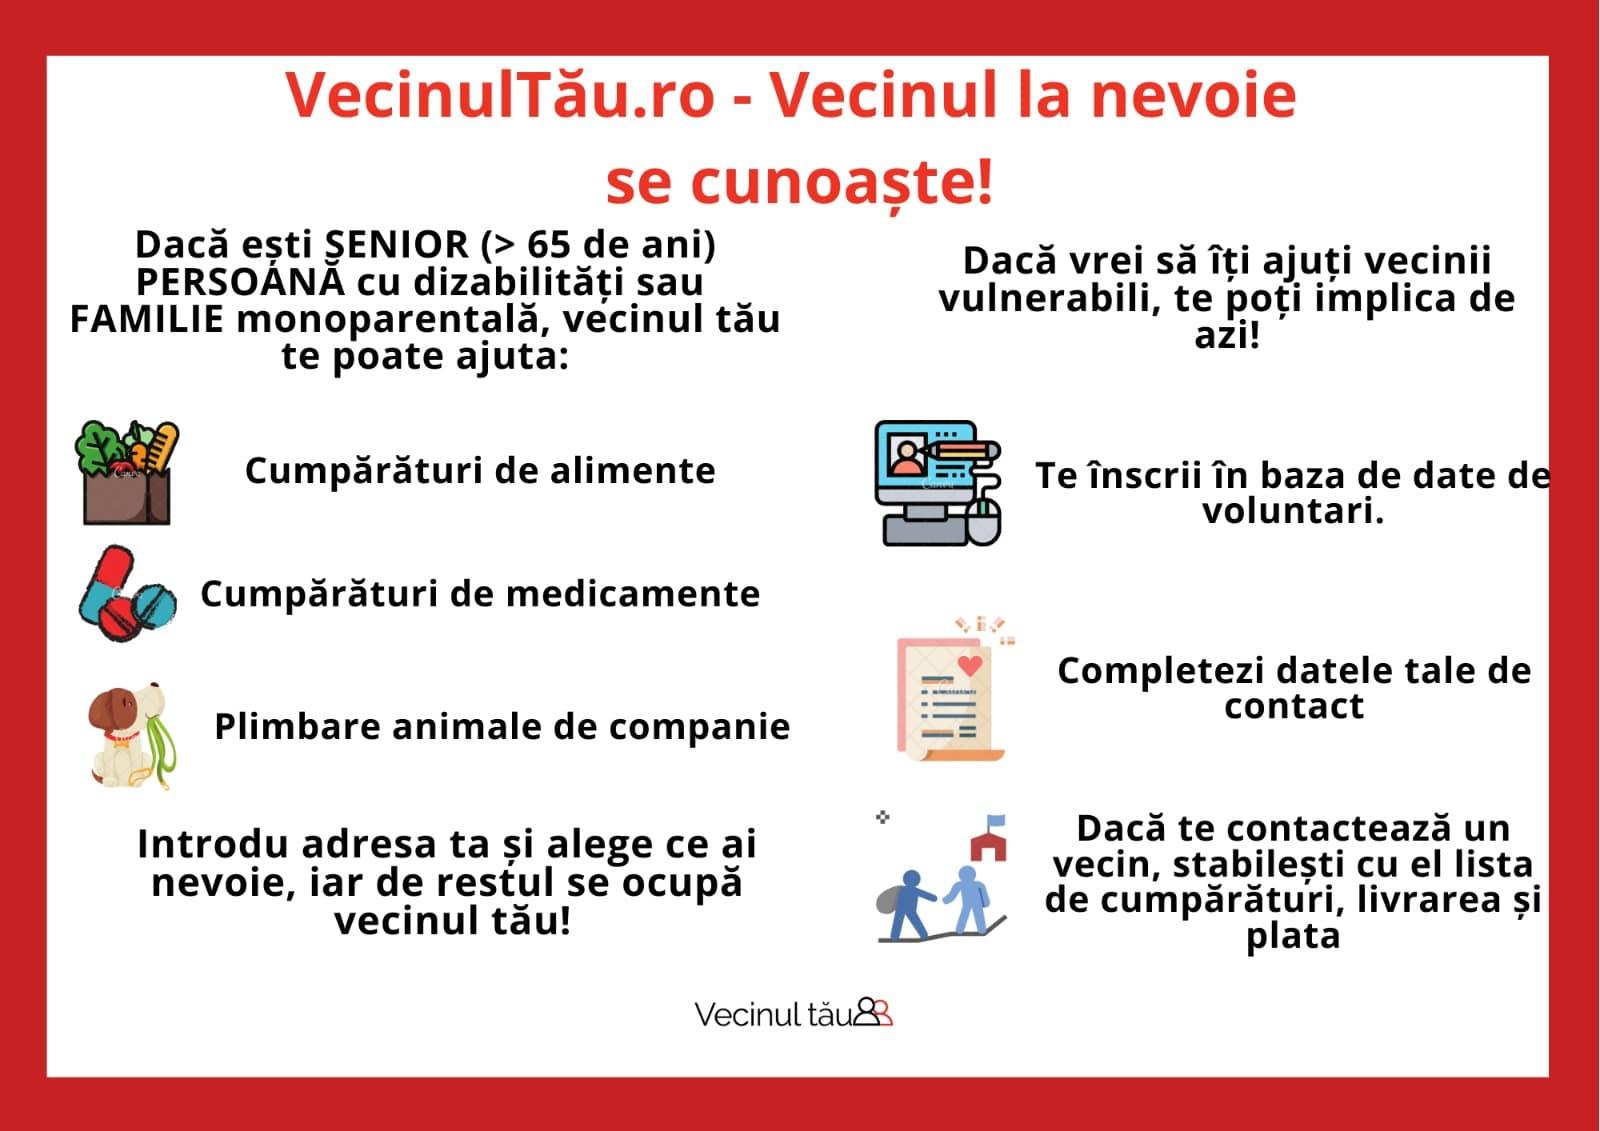 vecinultau.ro-covid19-serviciu-gratuit